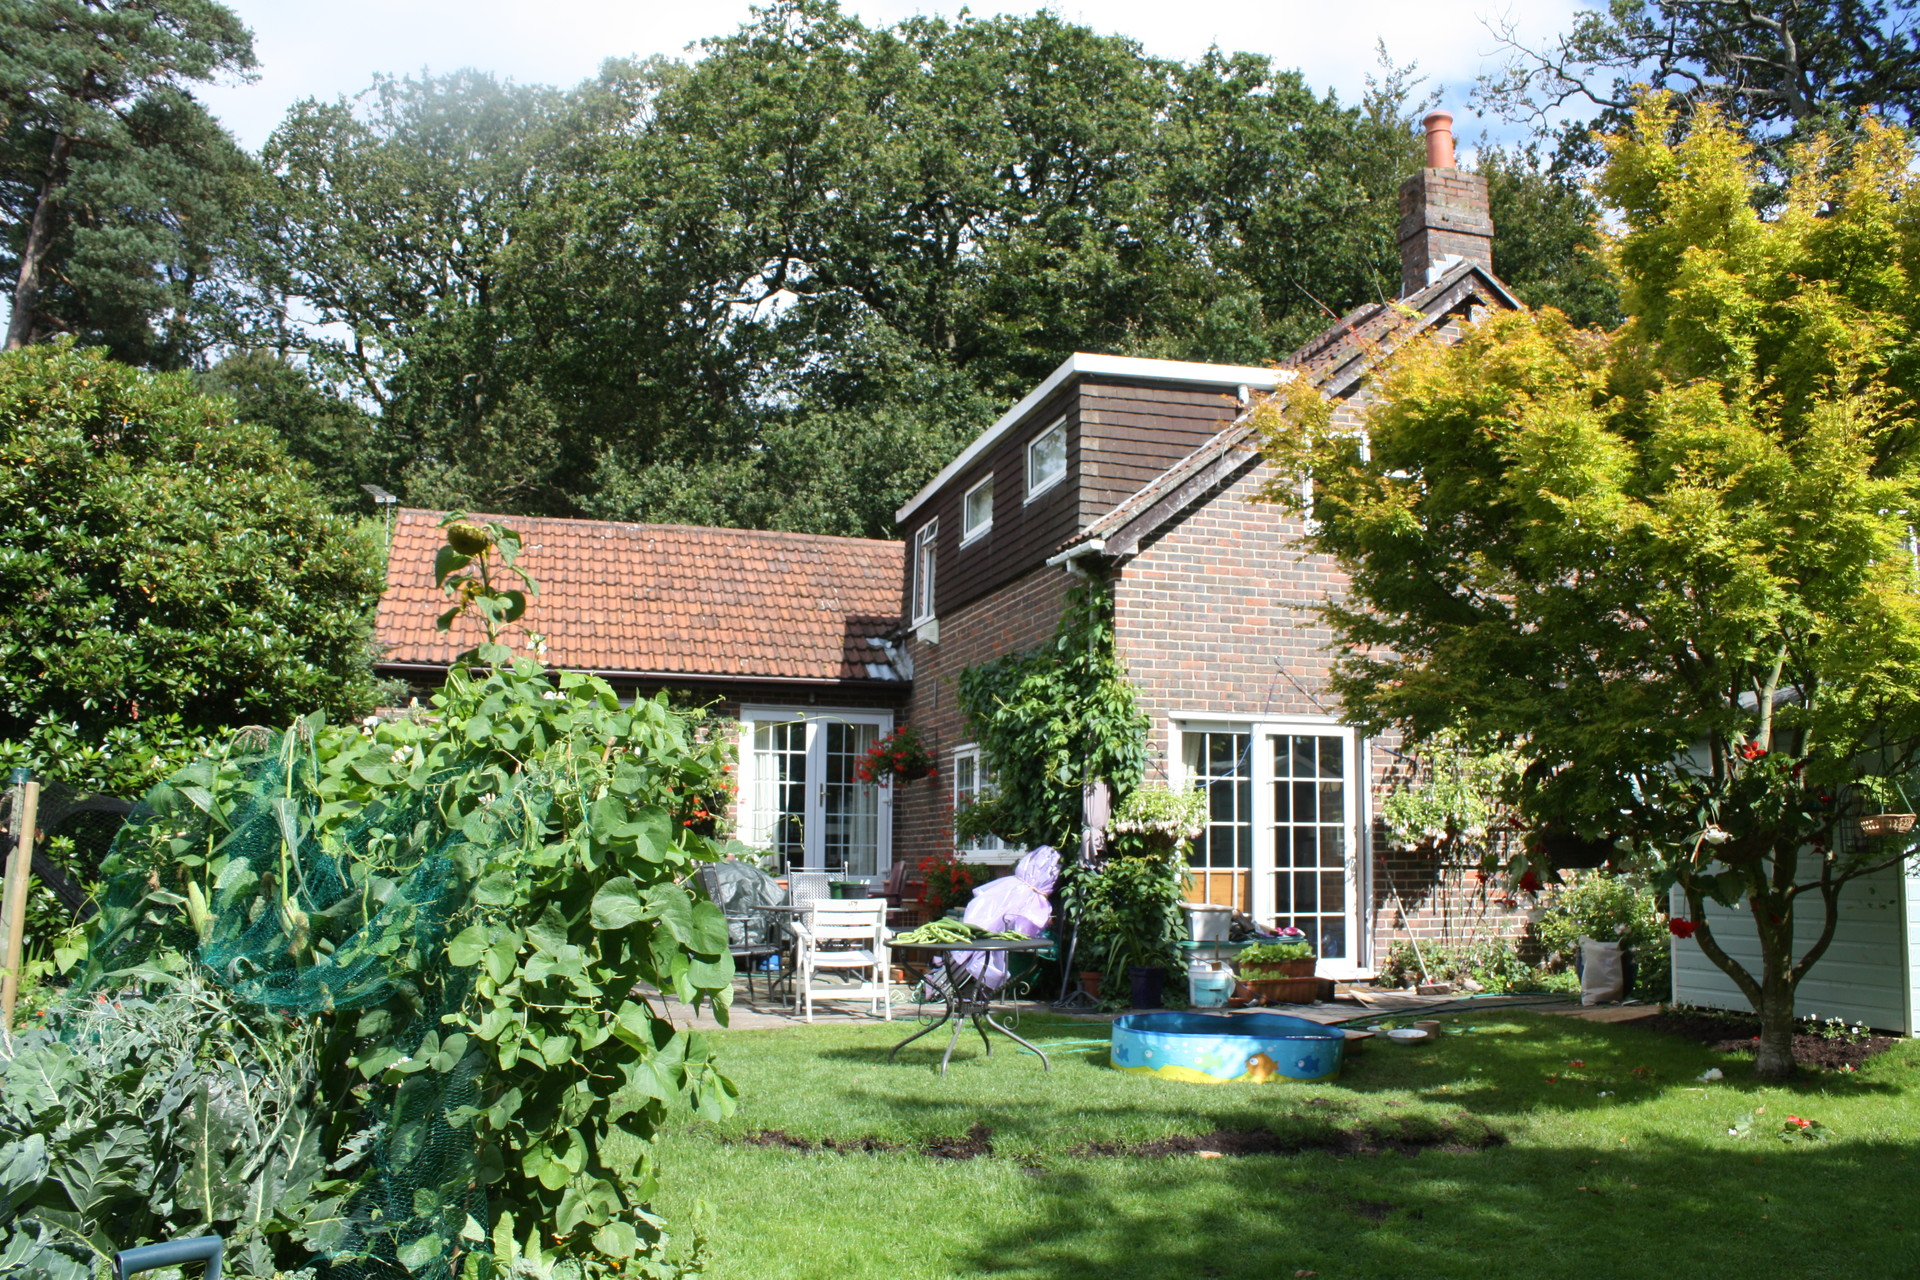 shared-flat-centre-family-house-40283c5a1212b5b2eca504a7534cfba8